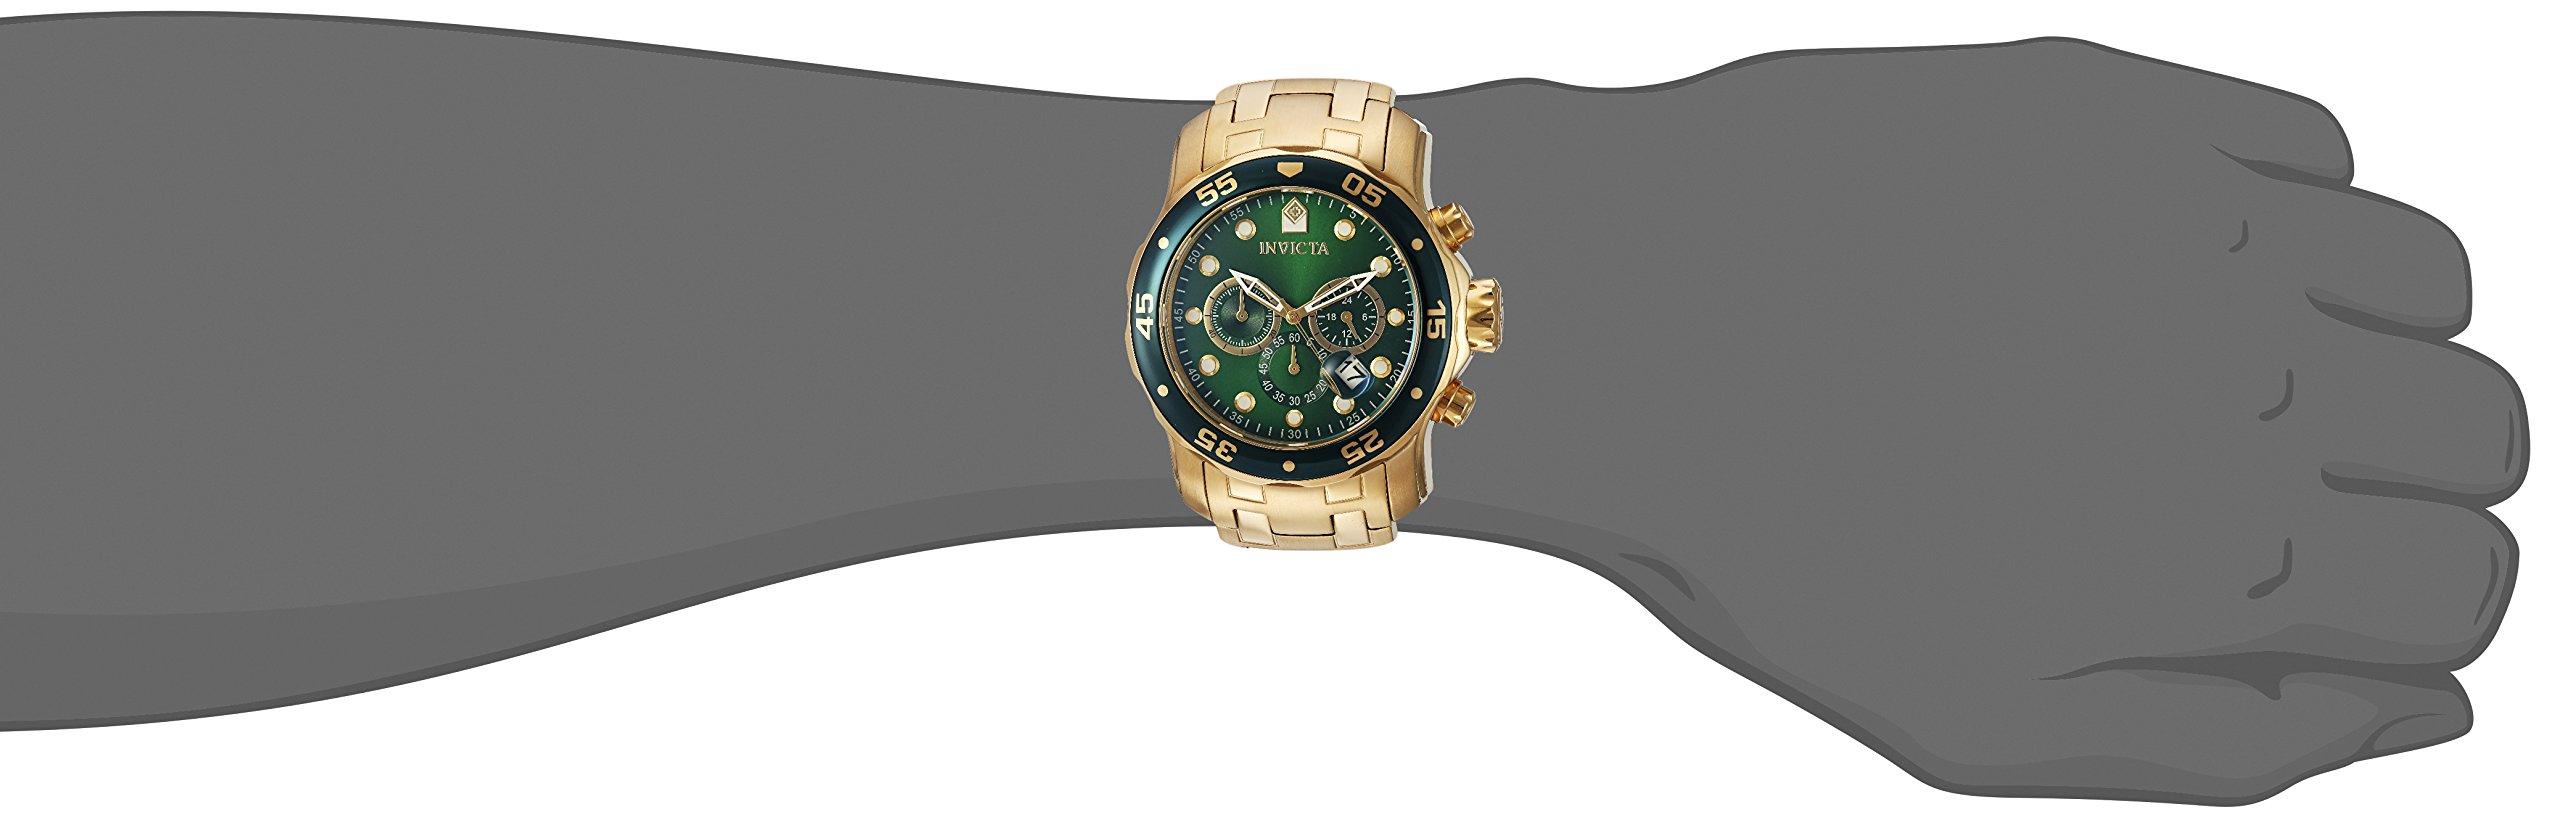 Invicta Men's 0075 Pro Diver Chronograph 18k Gold-Plated Watch by Invicta (Image #4)